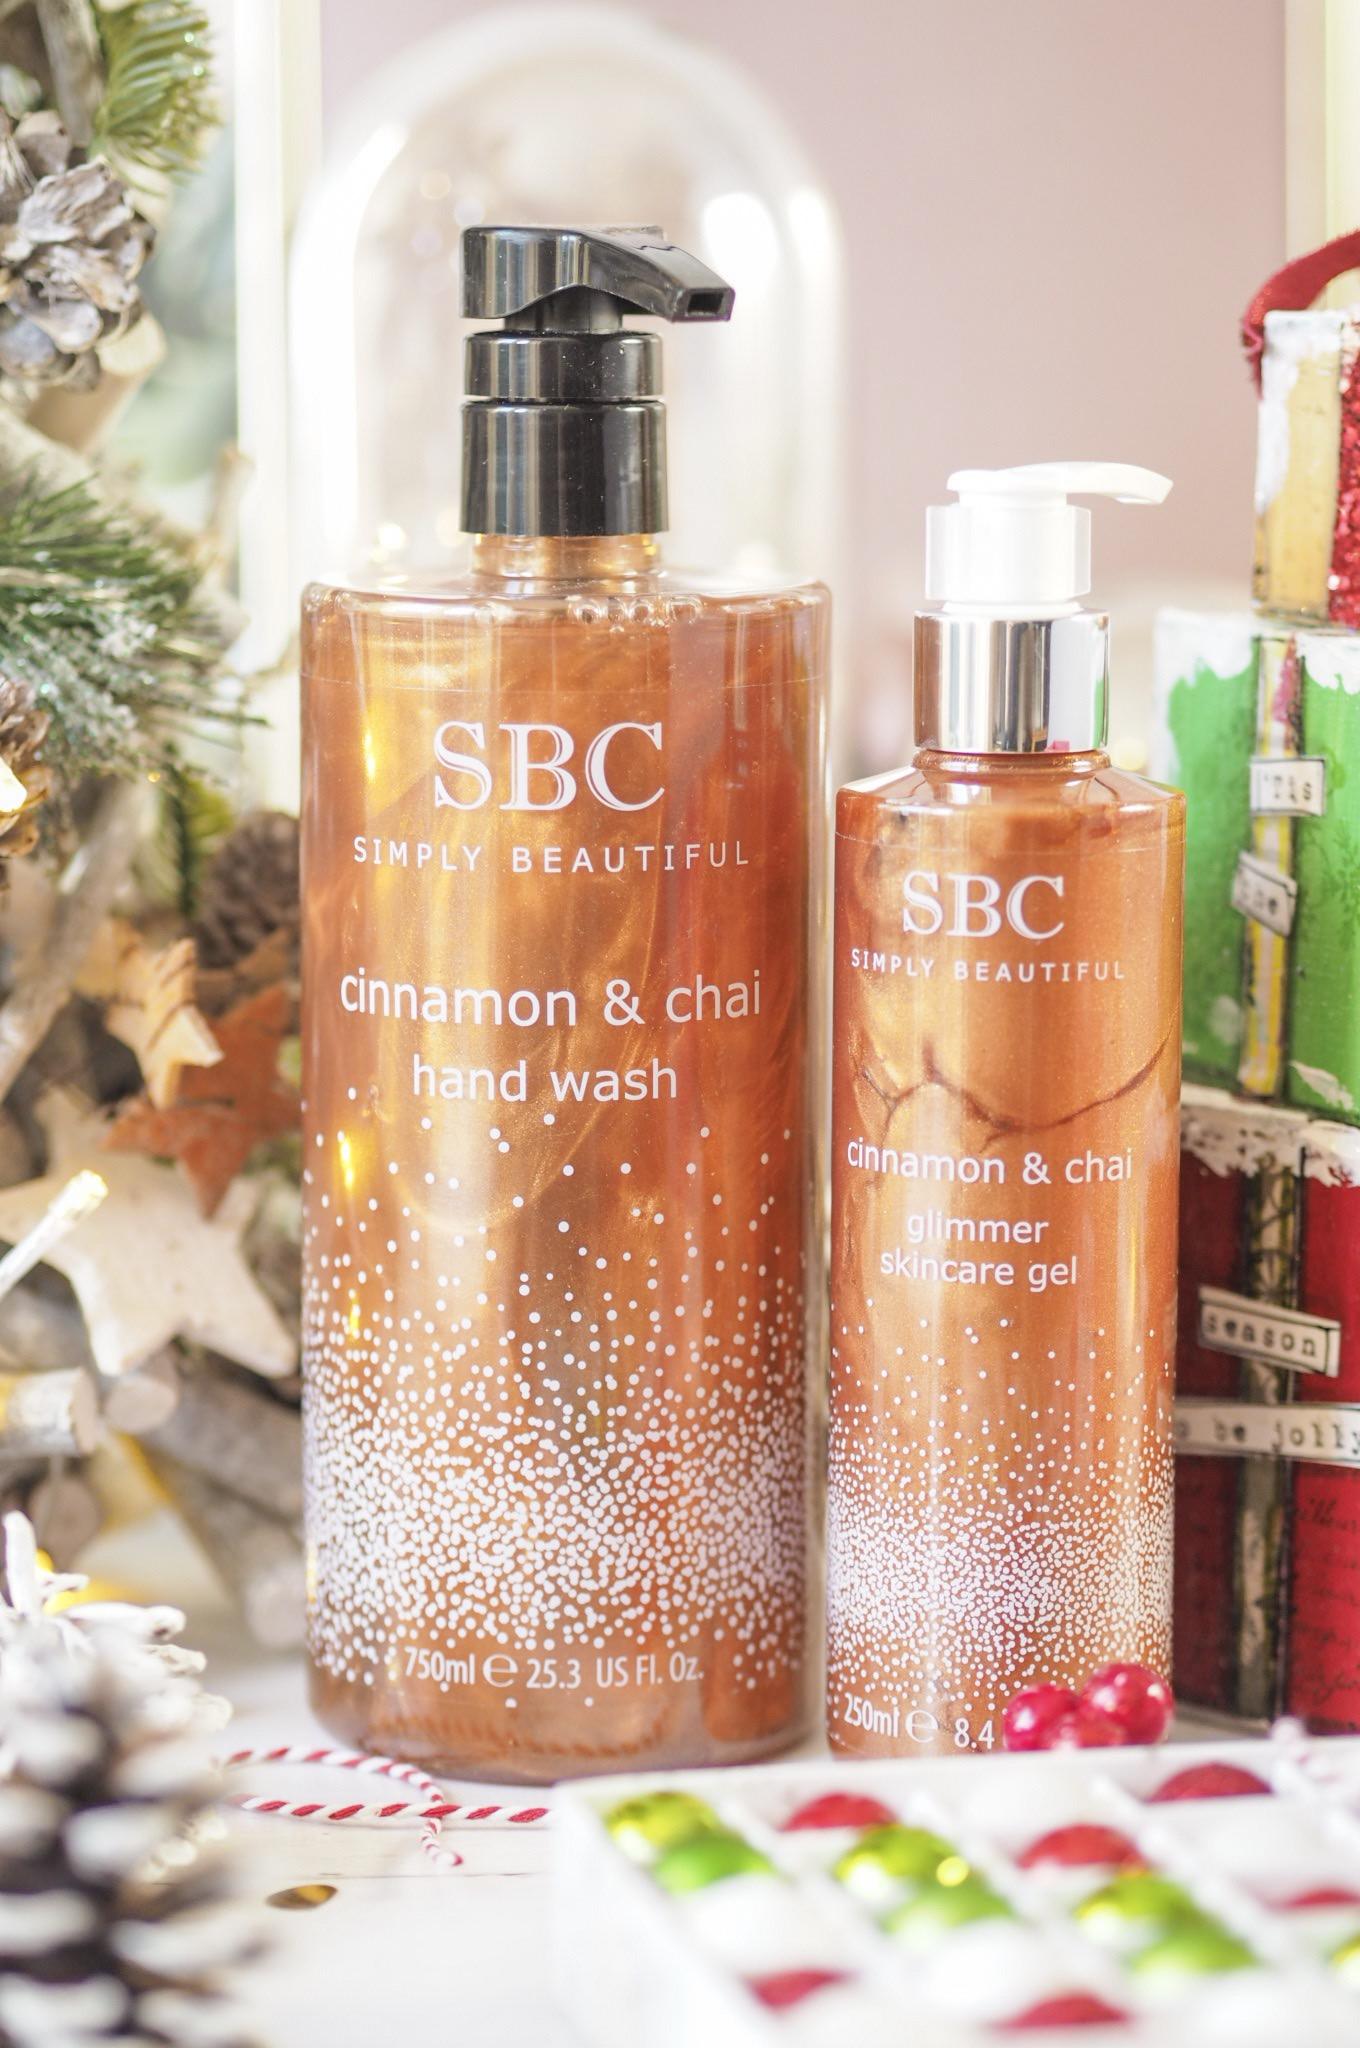 SBC Cinnamon & Chai Handwash & Glimmer Skincare Gel